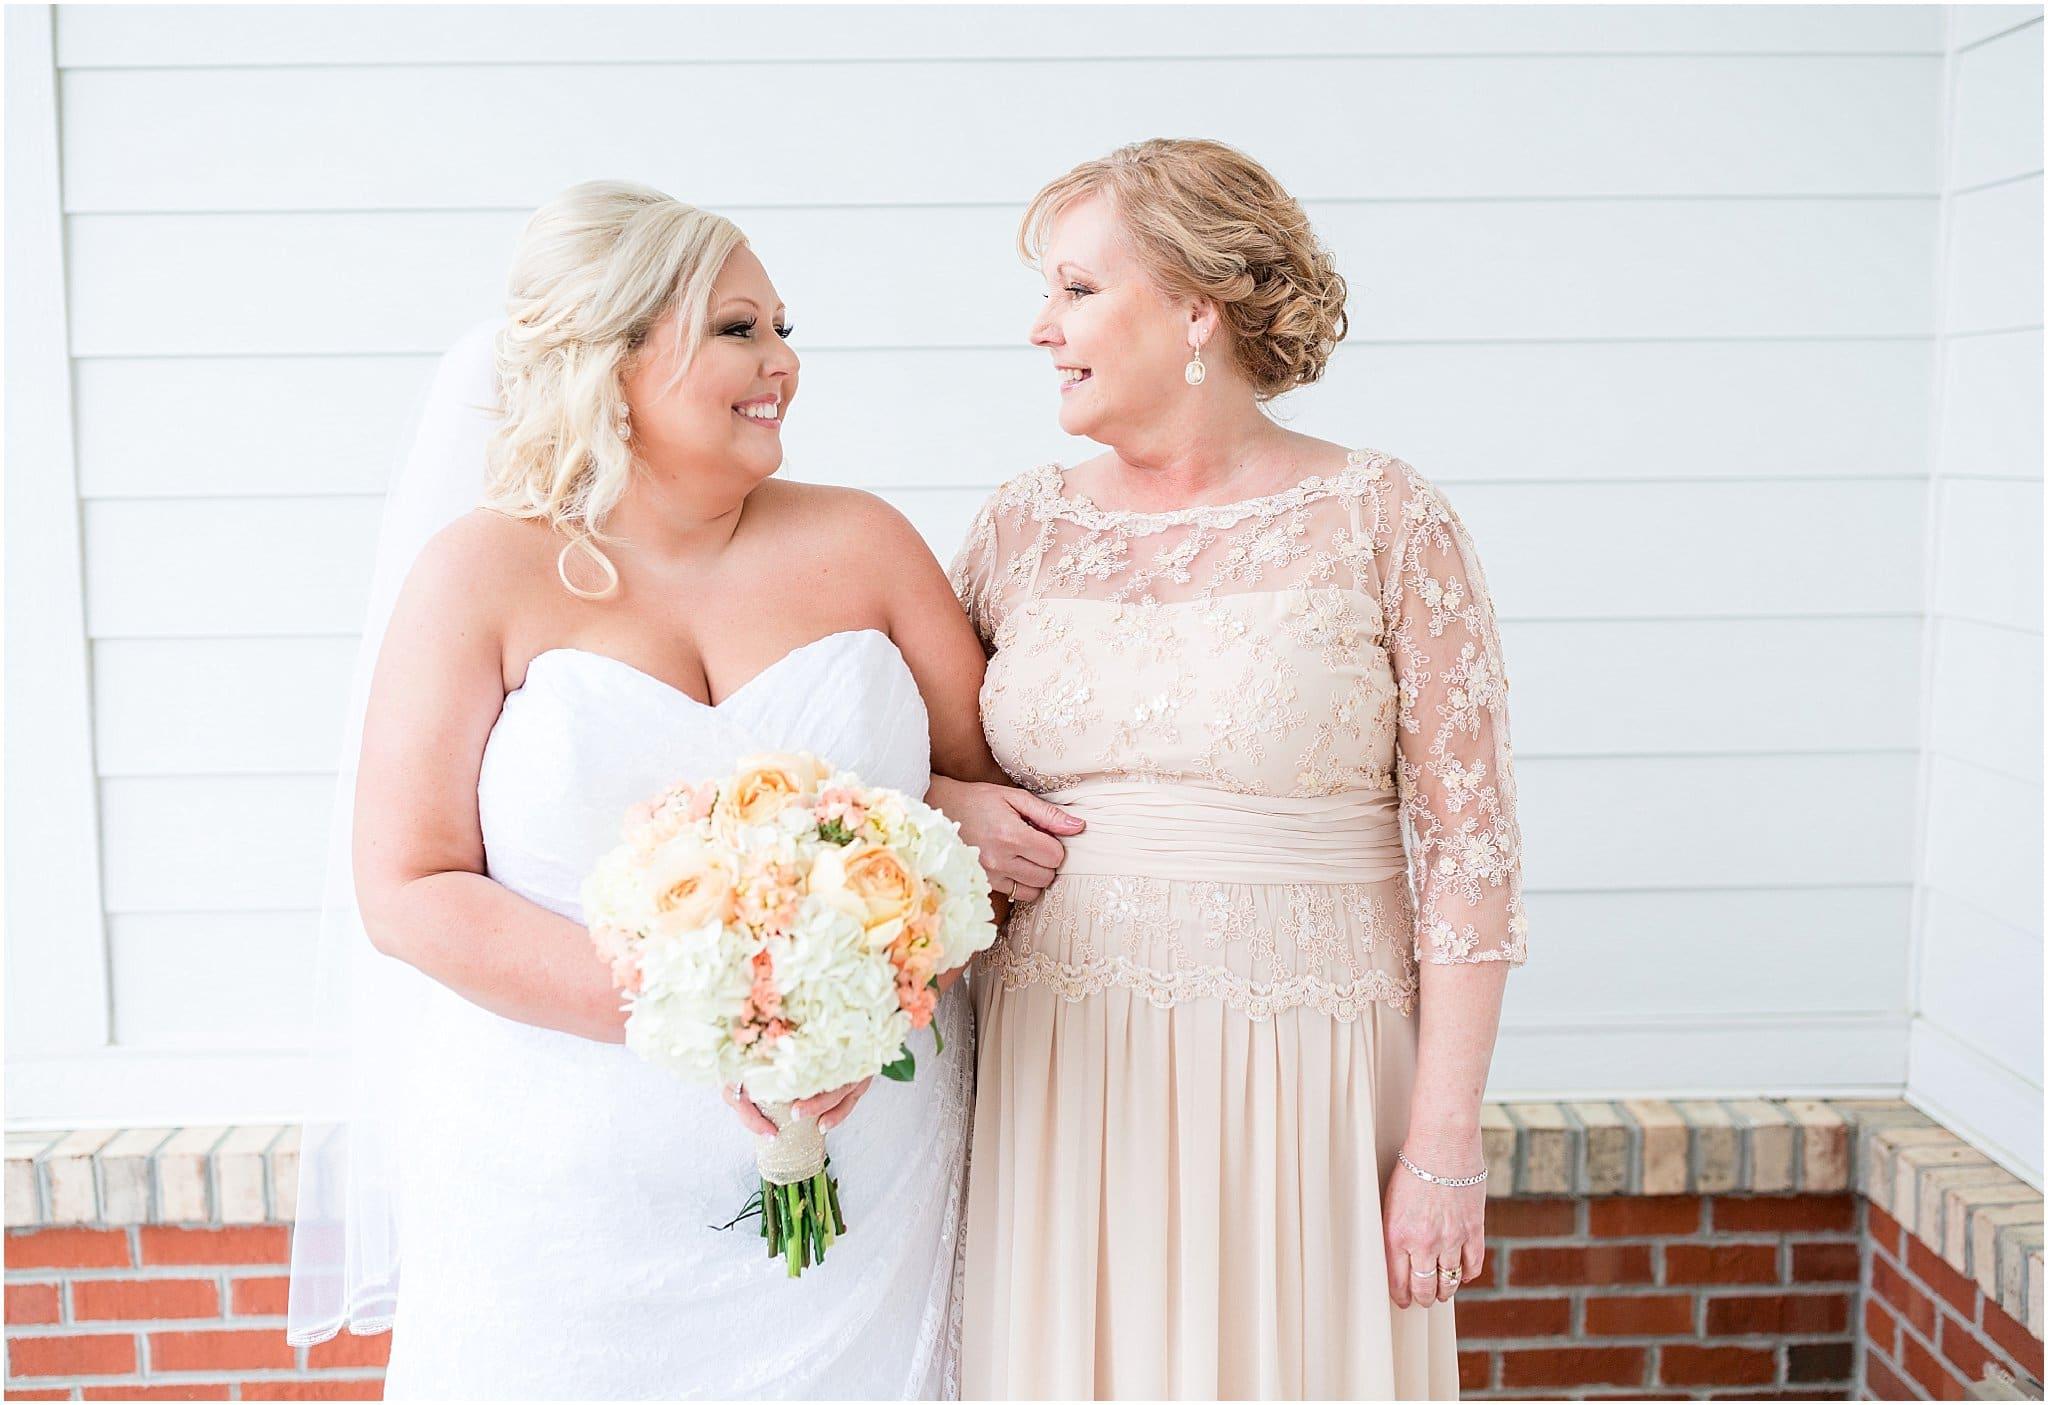 jessscott-milsboro-delaware-wedding-cassidymrphotography_0031